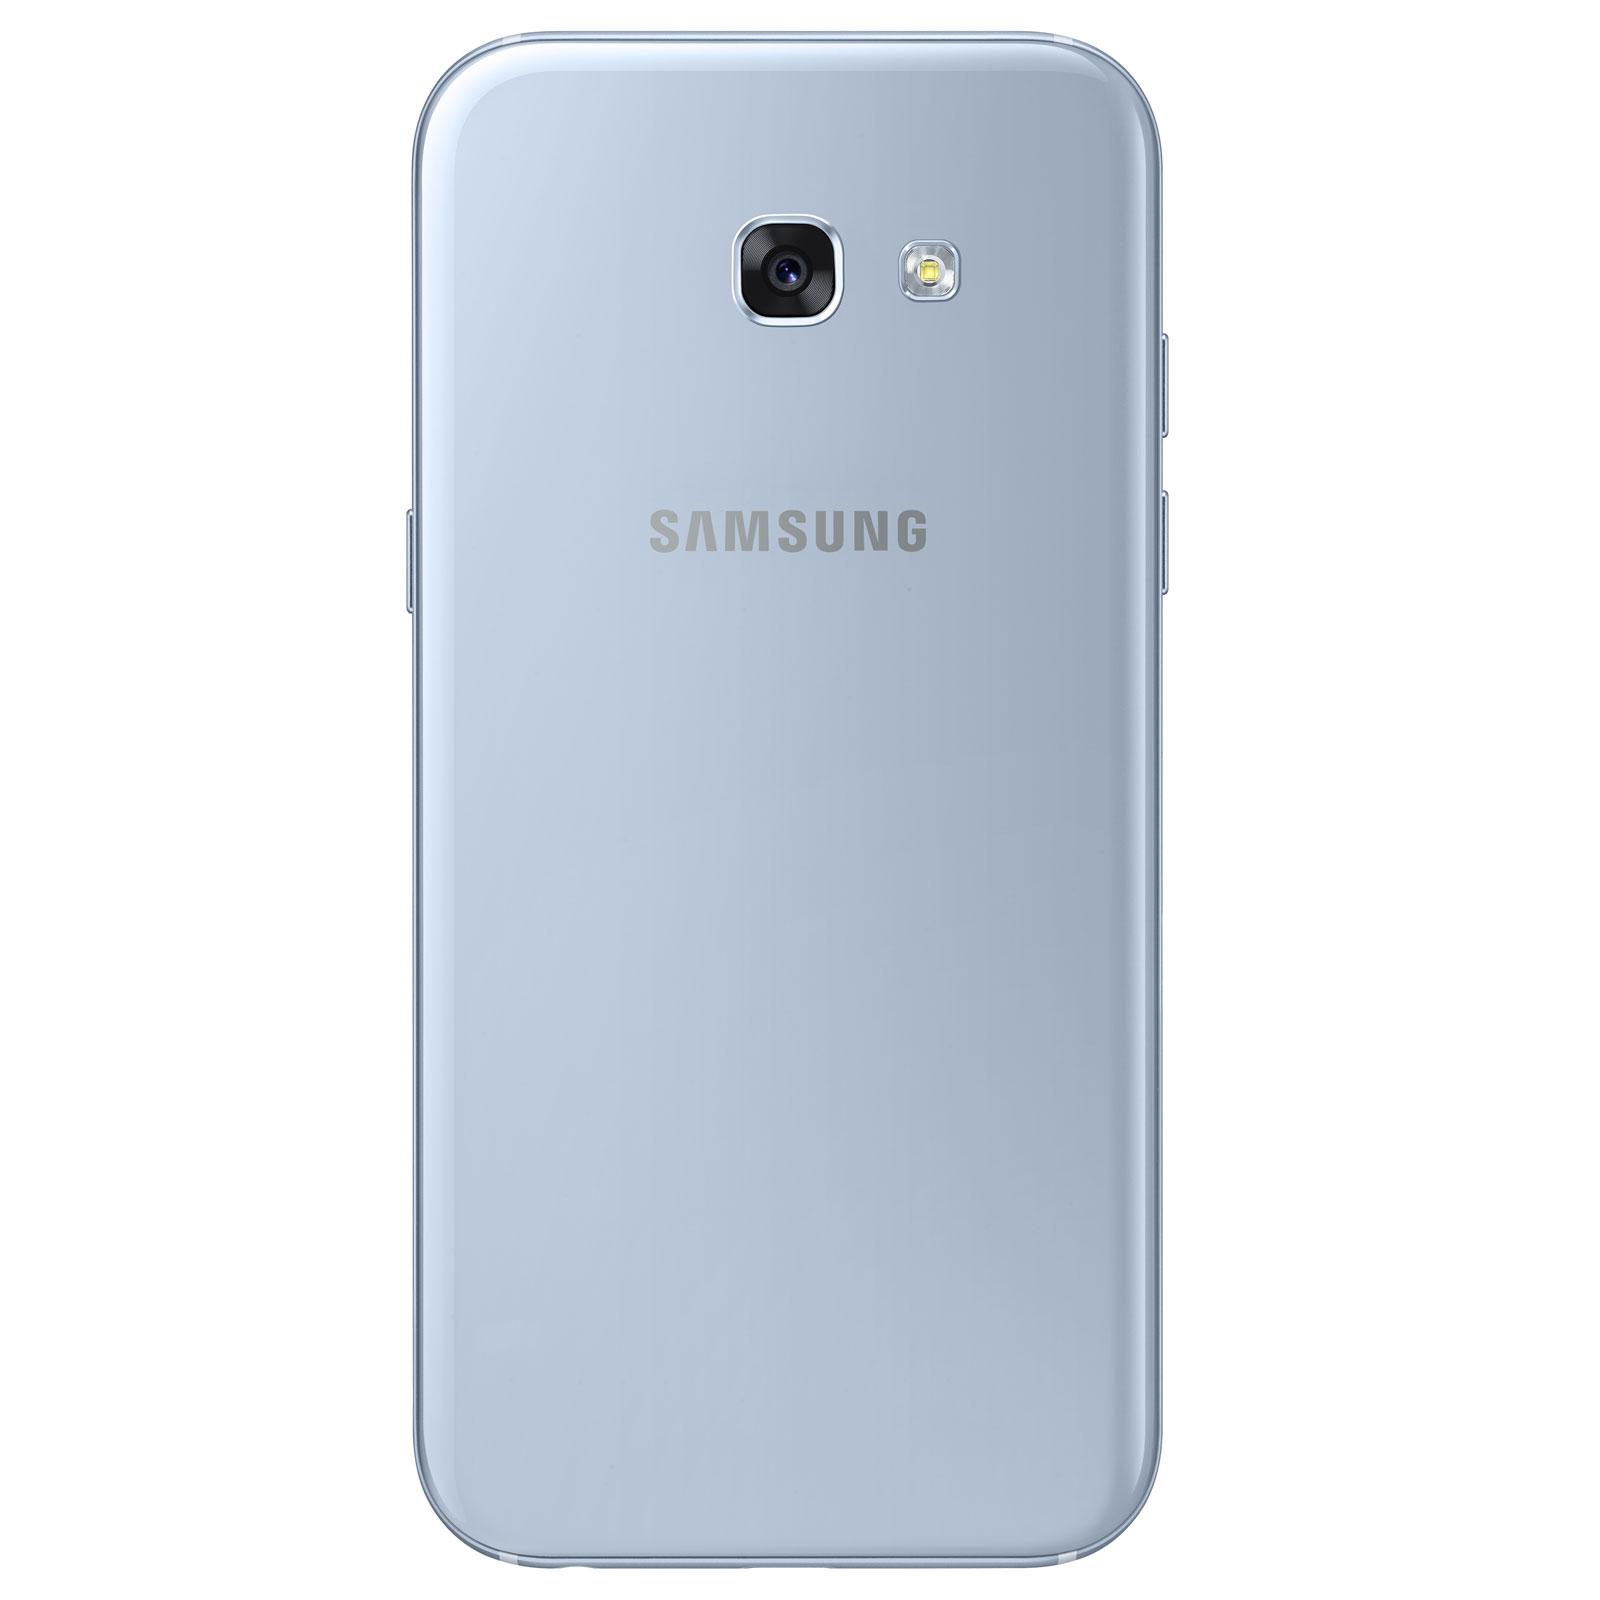 samsung galaxy a5 2017 bleu mobile smartphone samsung sur. Black Bedroom Furniture Sets. Home Design Ideas